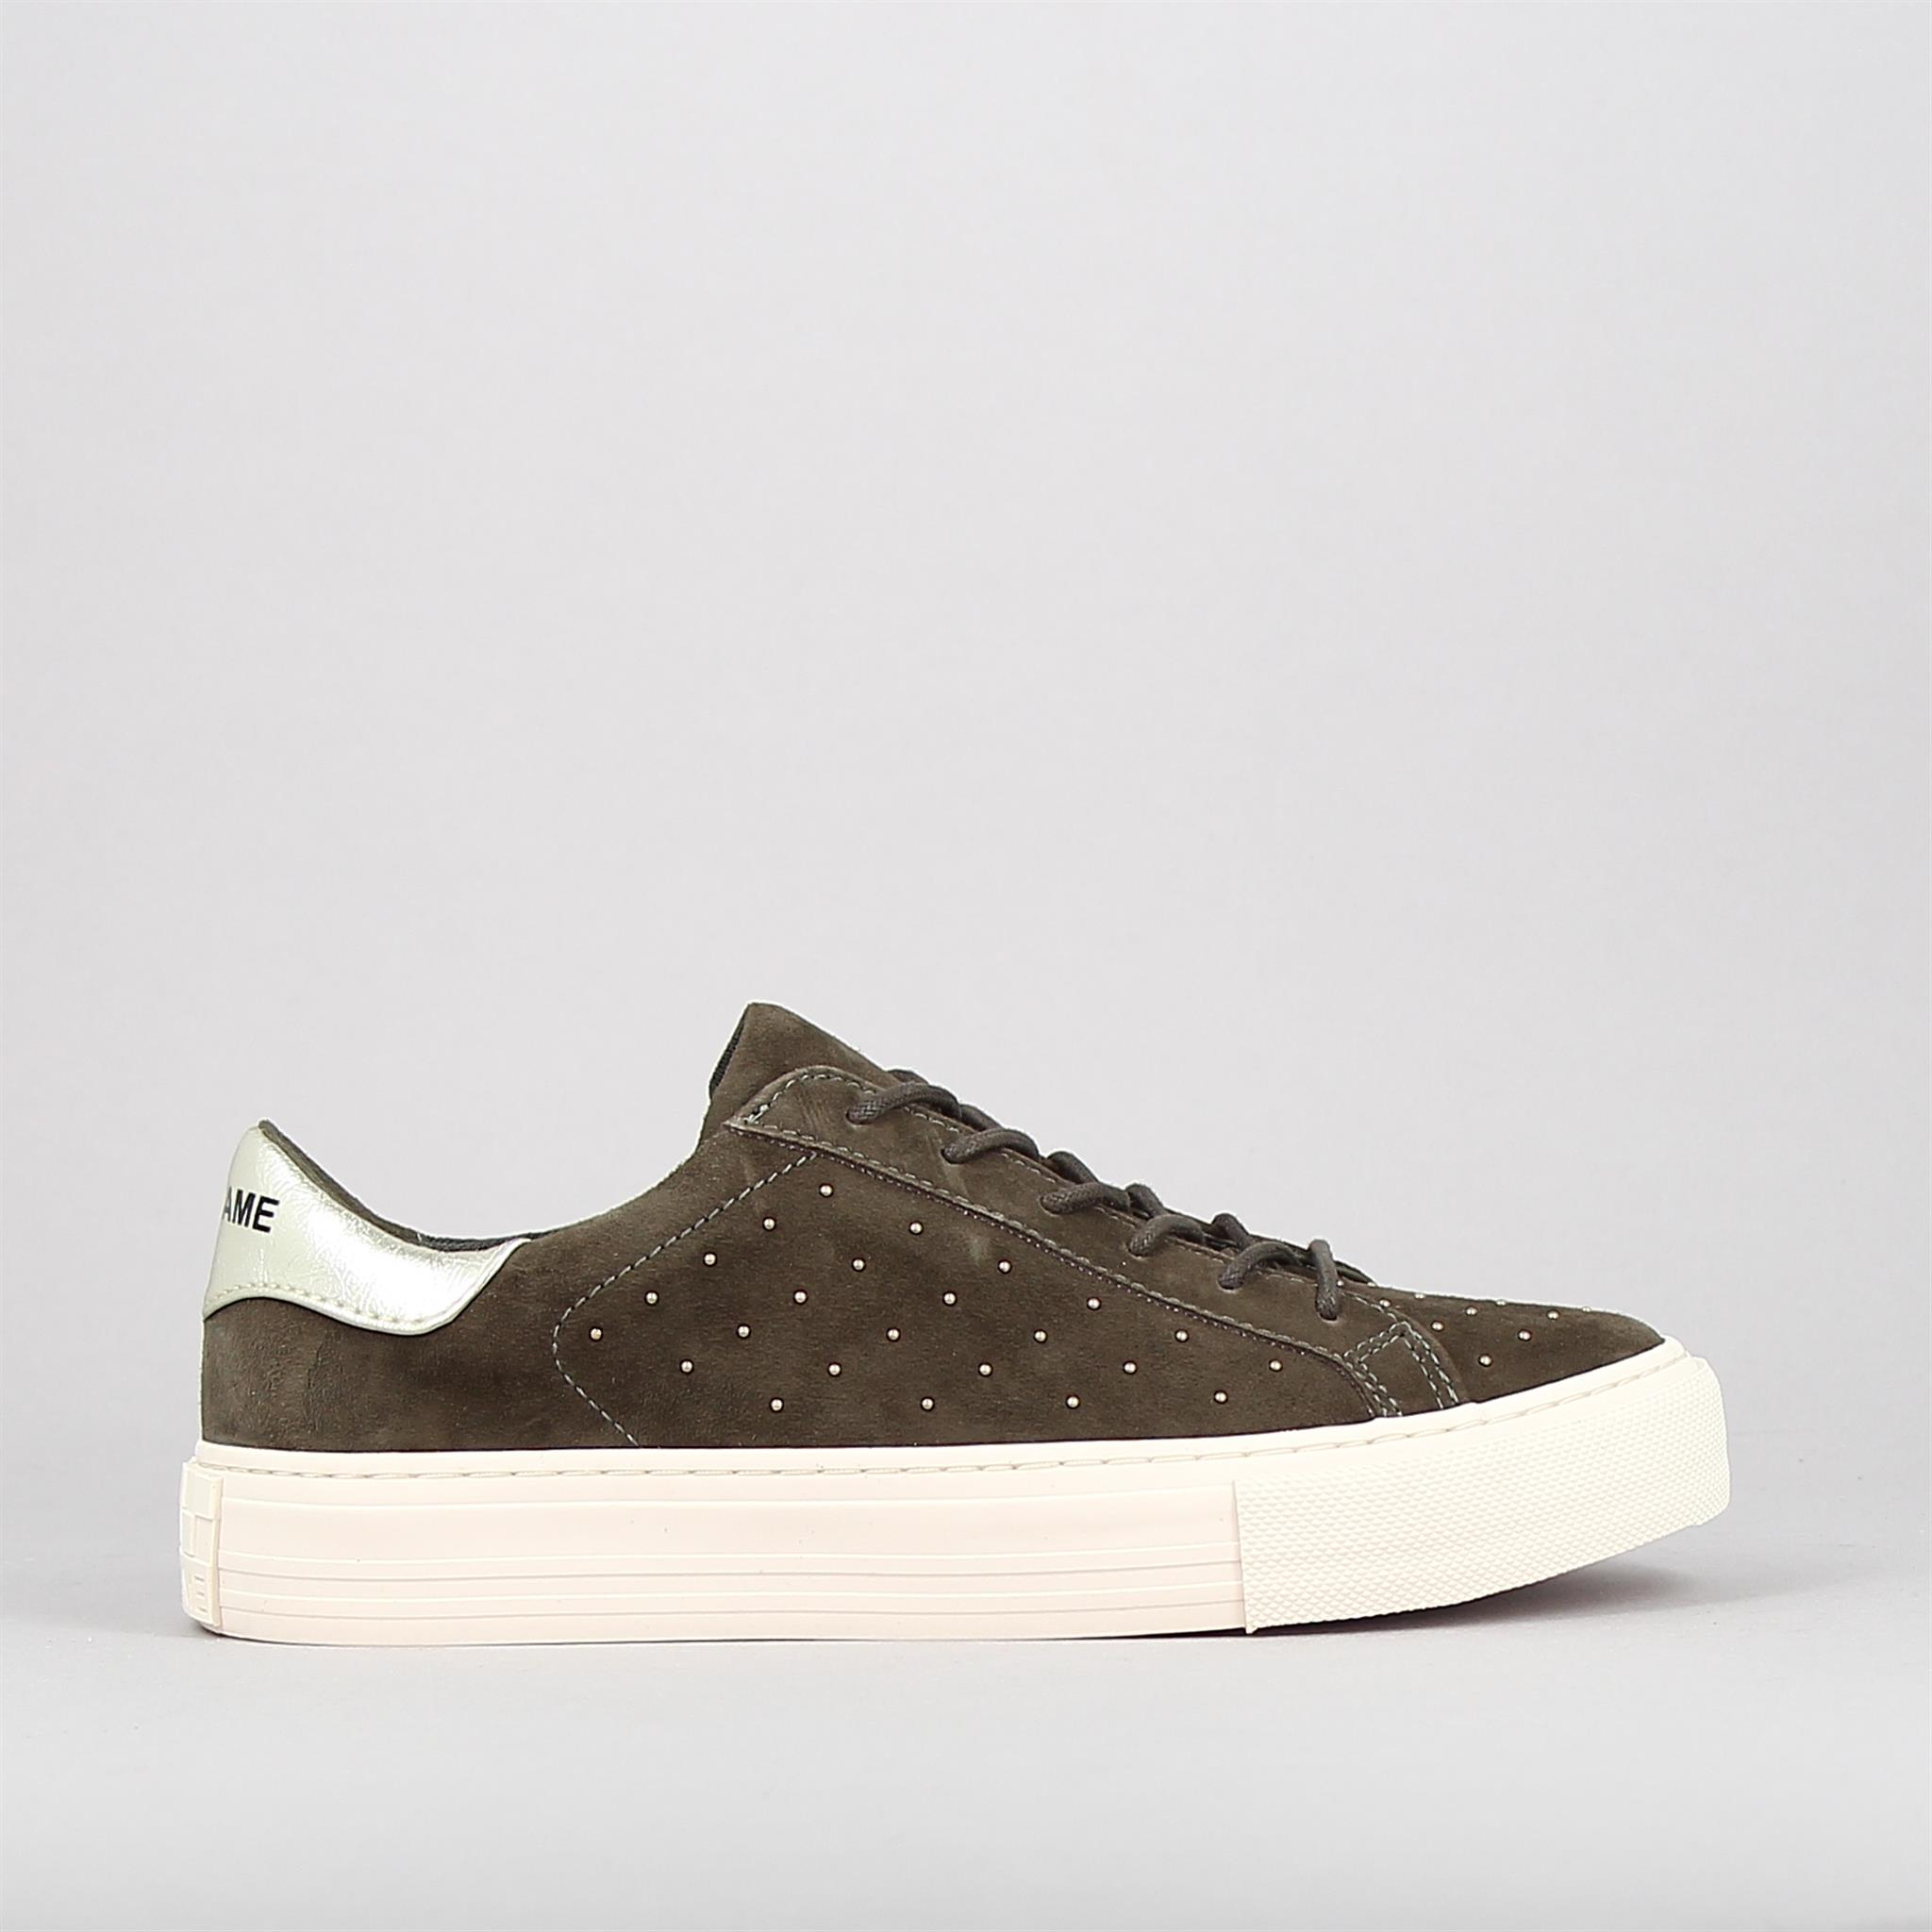 arcade-sneaker-1819-kaki-158941186-0.jpg